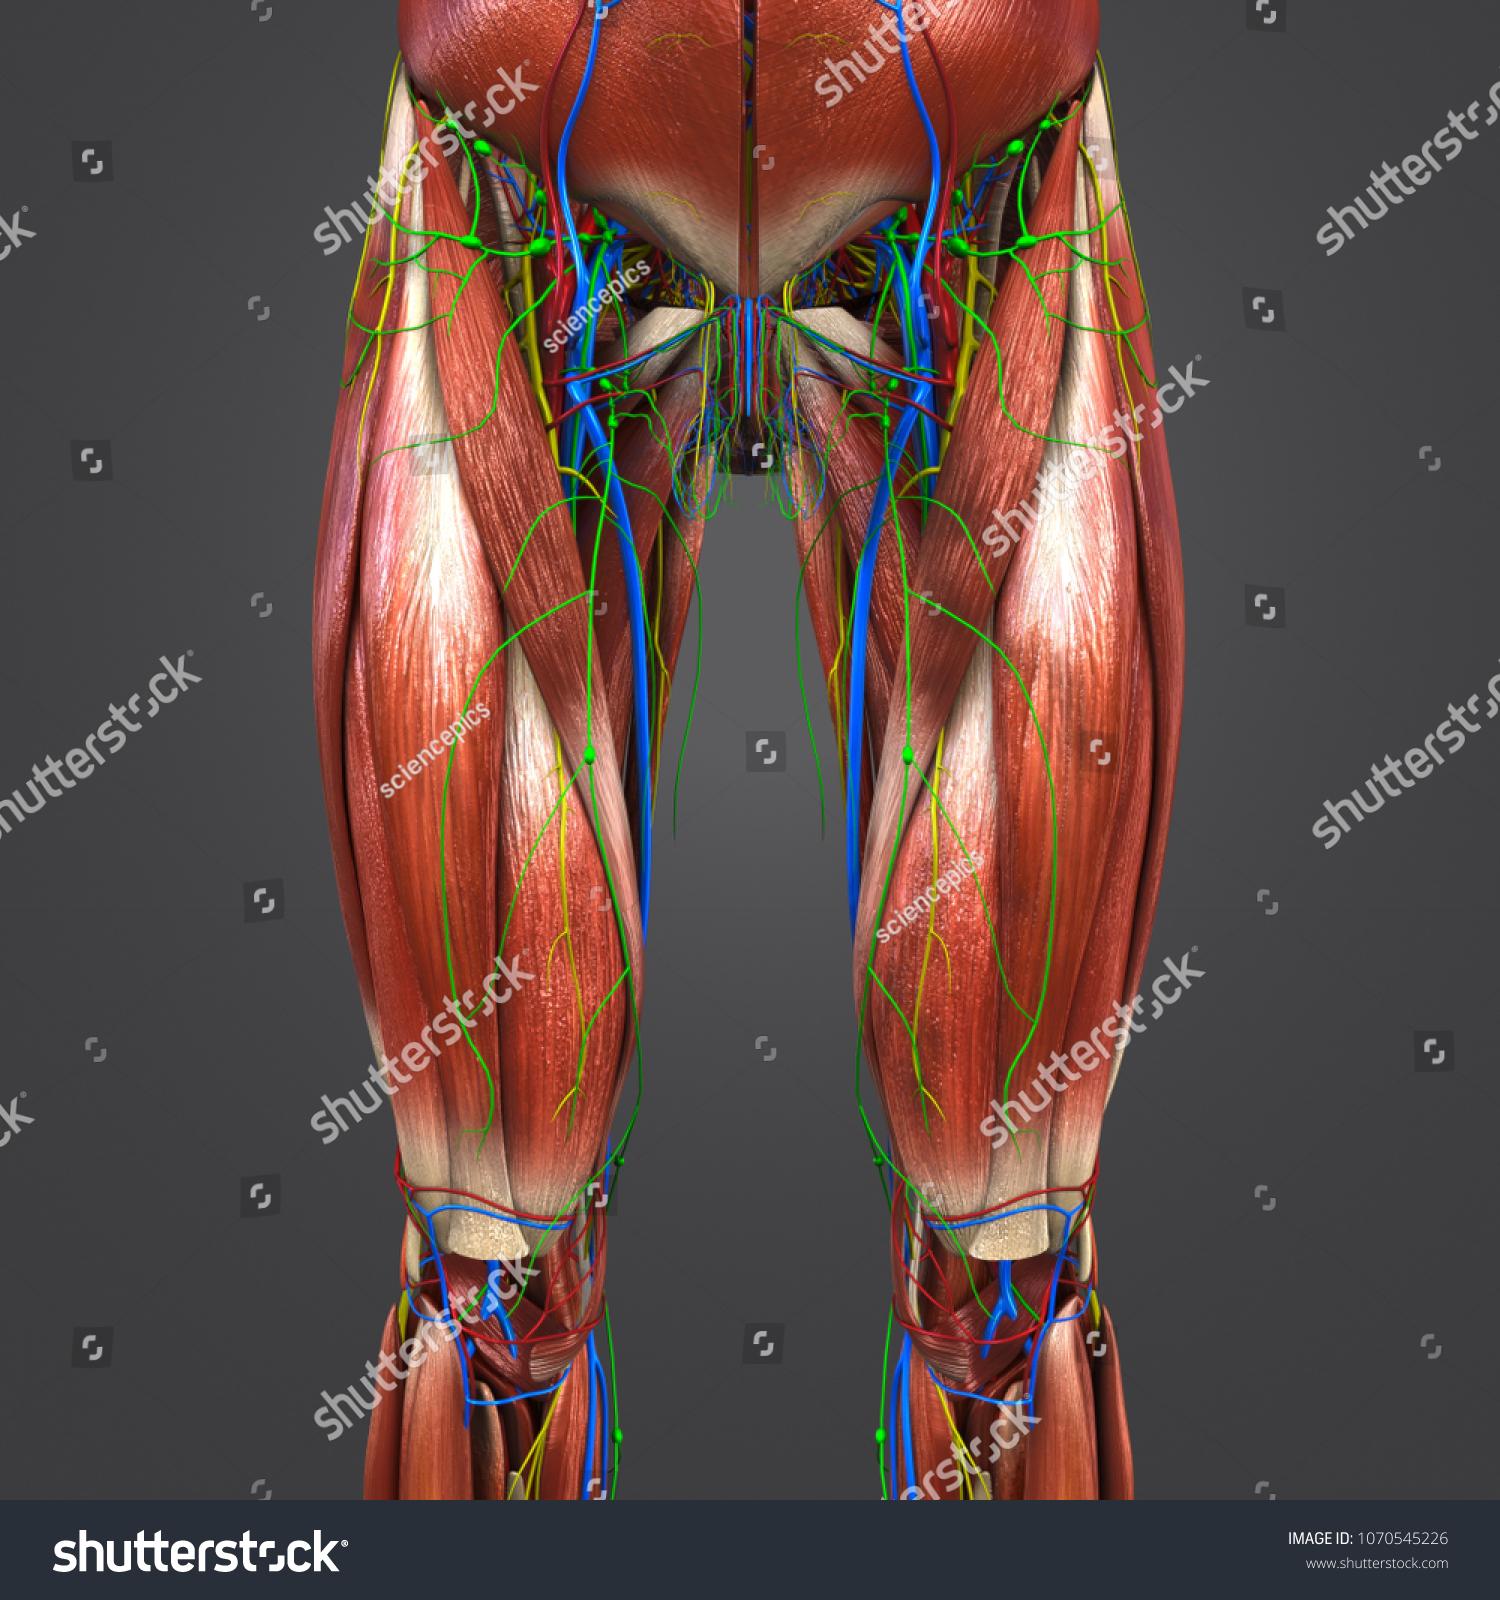 Lower Limbs Muscle Anatomy Arteries Veins Stock Illustration ...